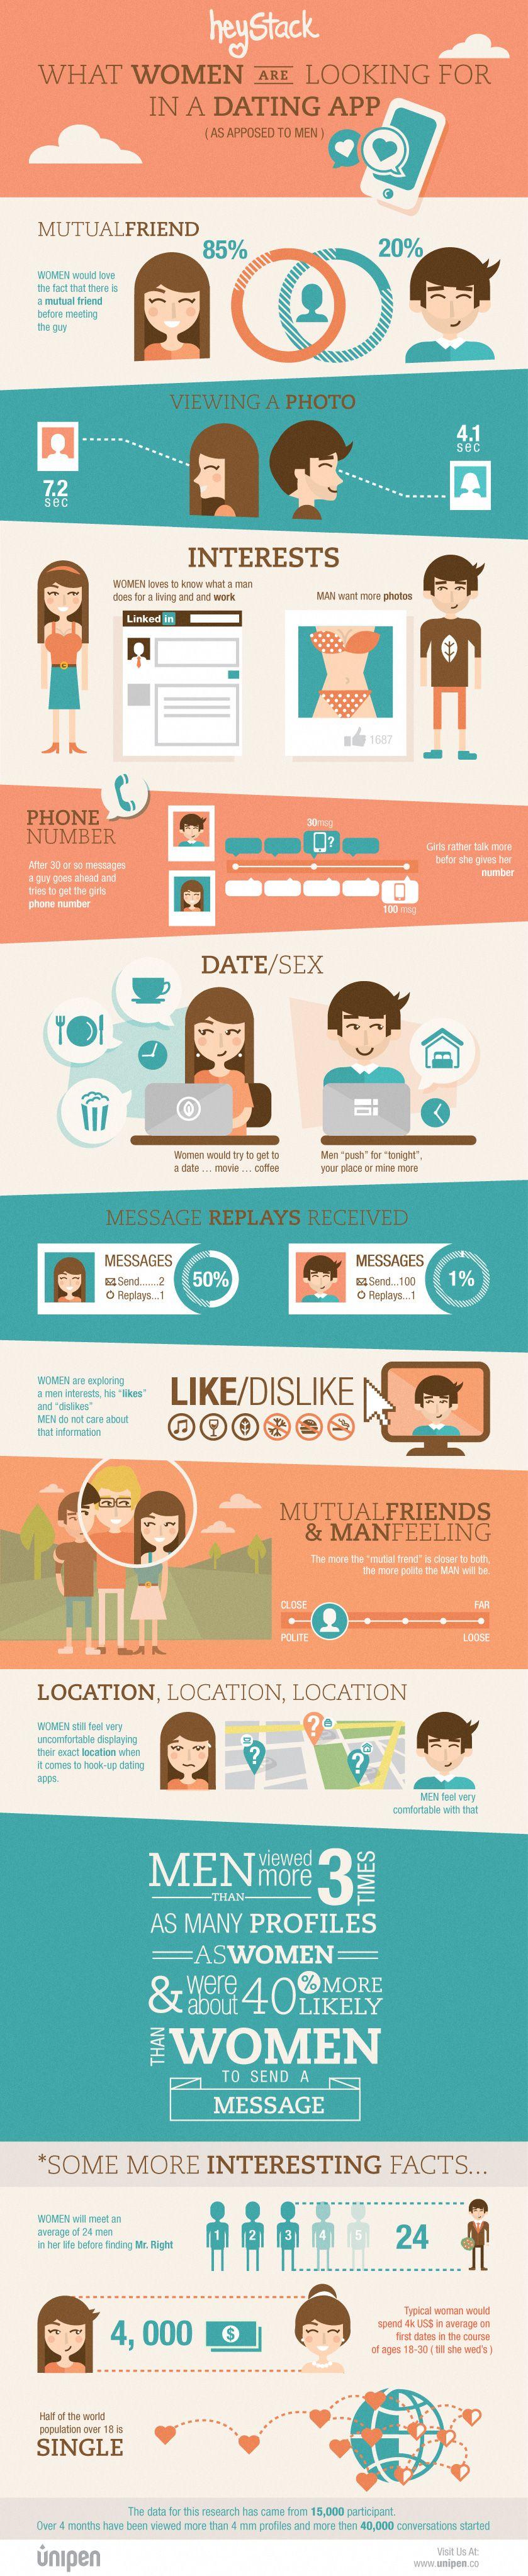 top aplicatii dating pčinja